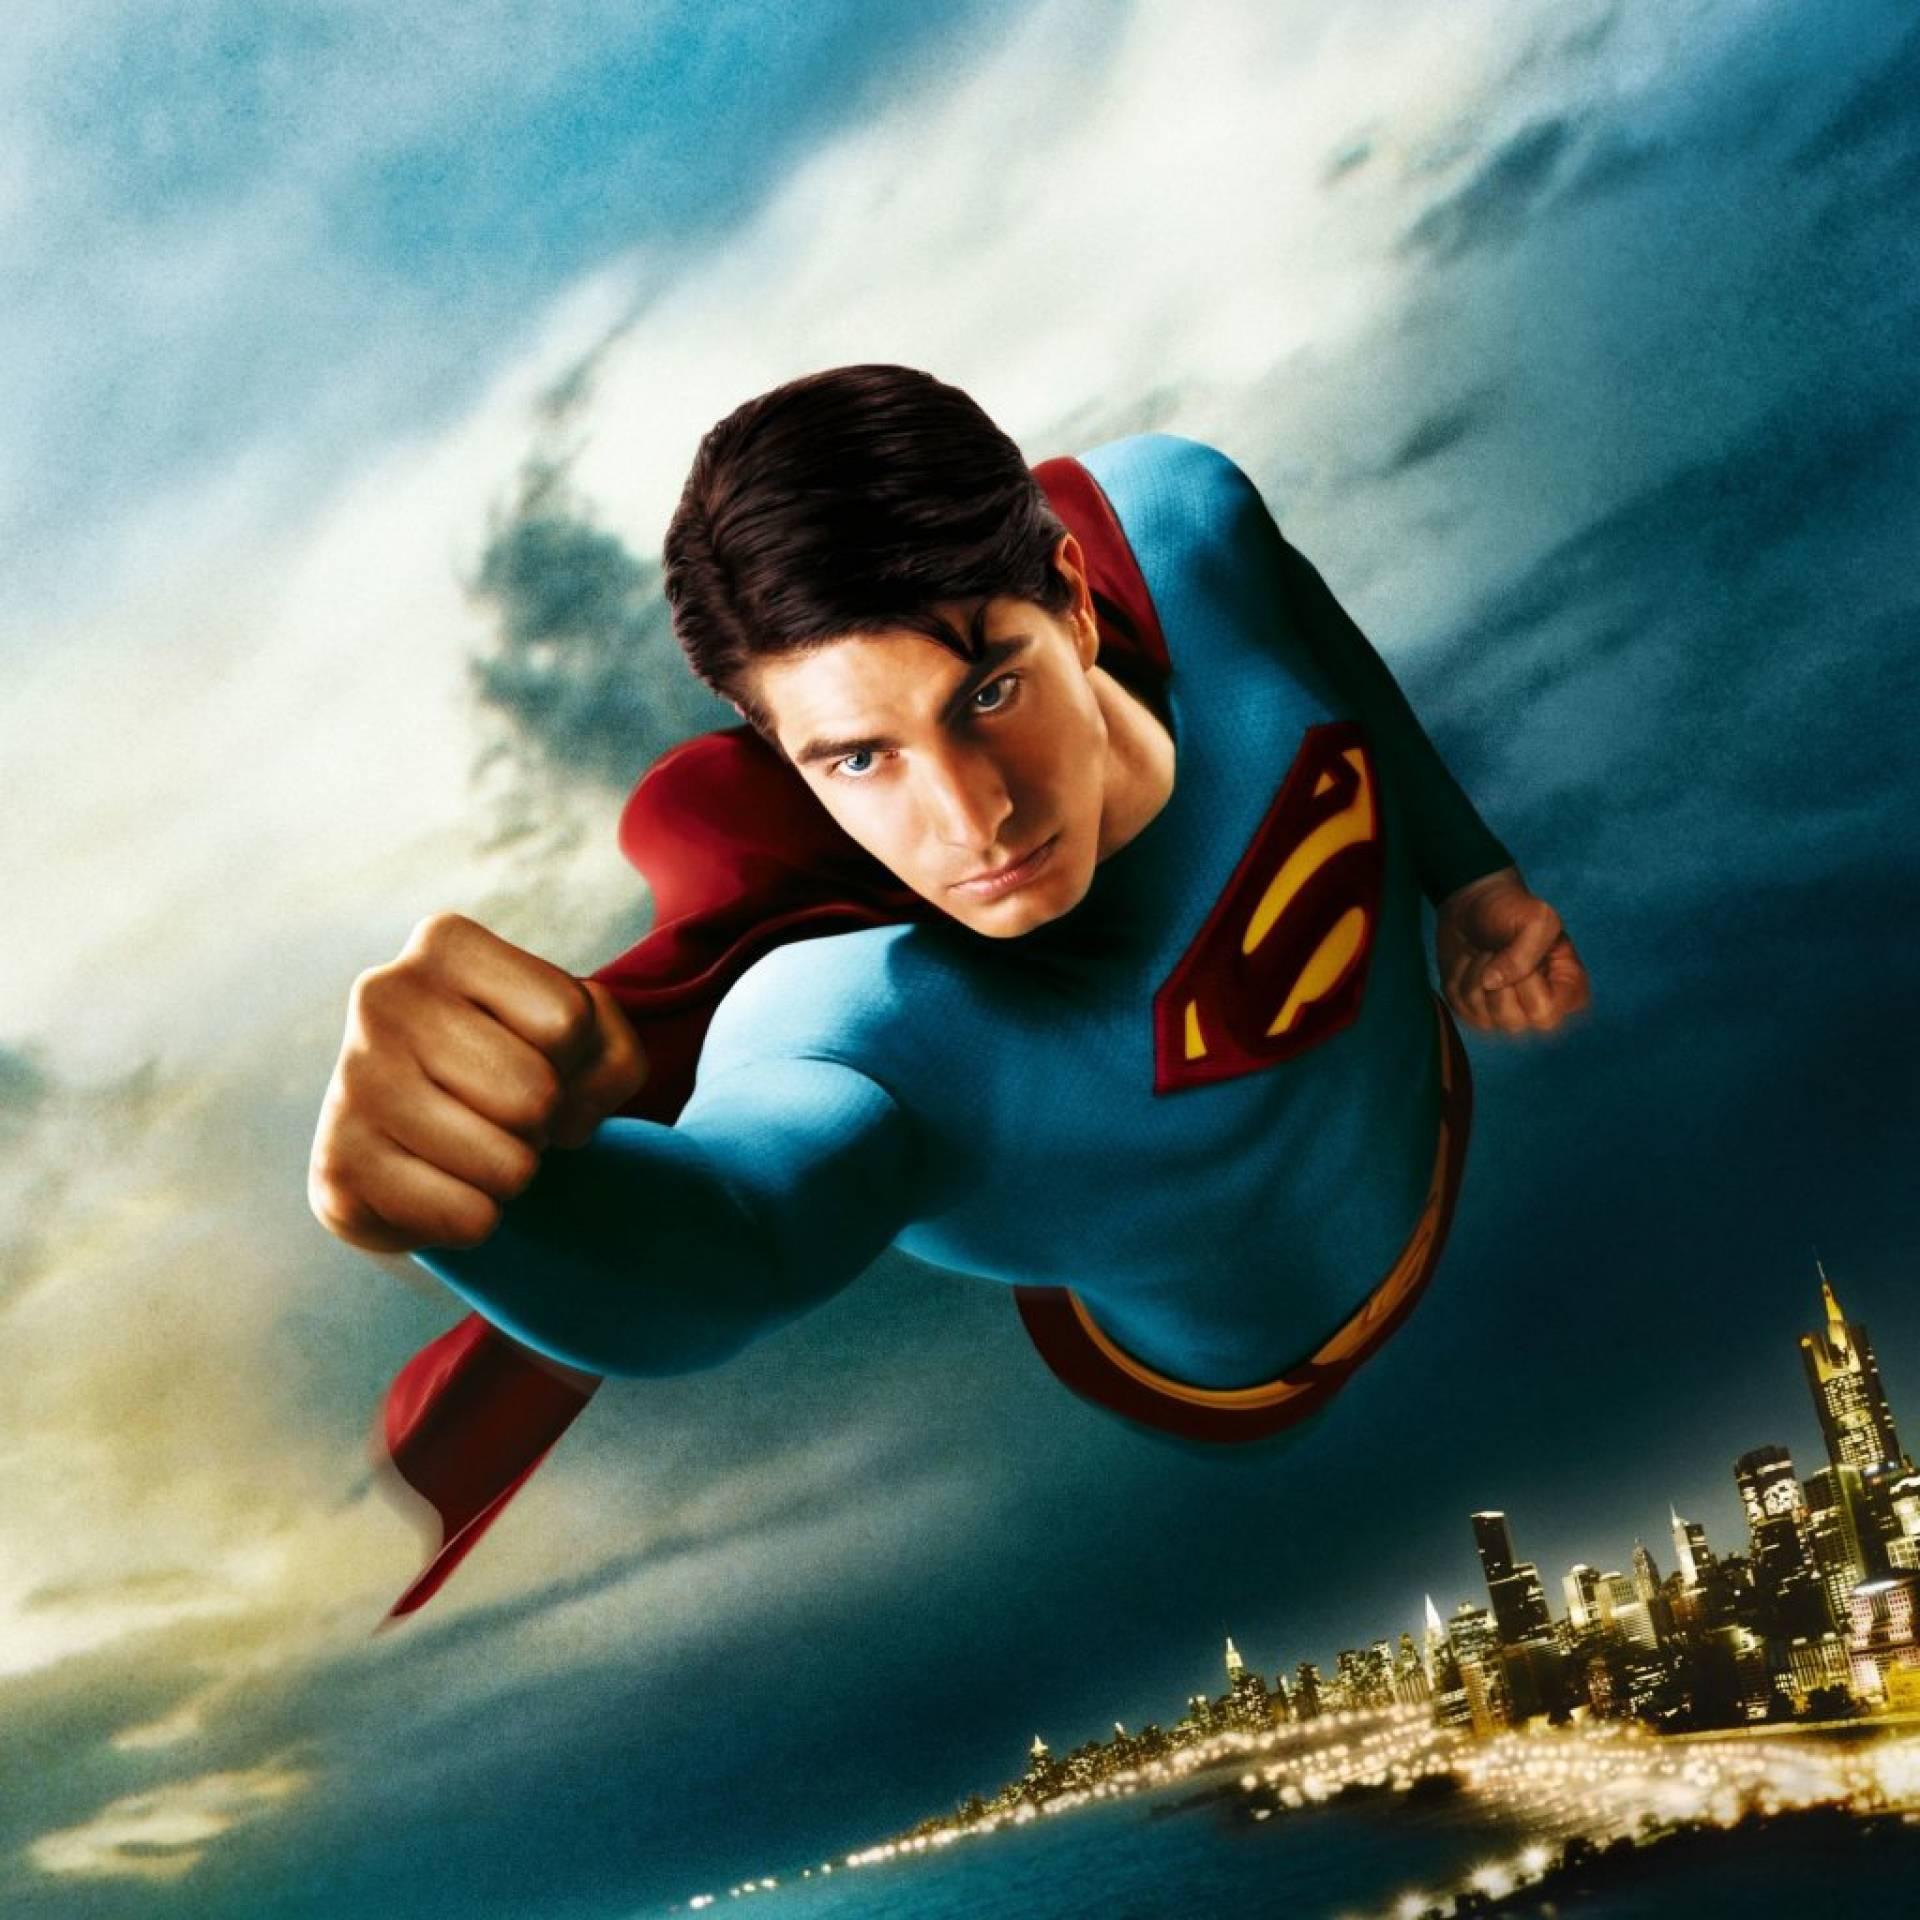 Superman, in: The broken condom